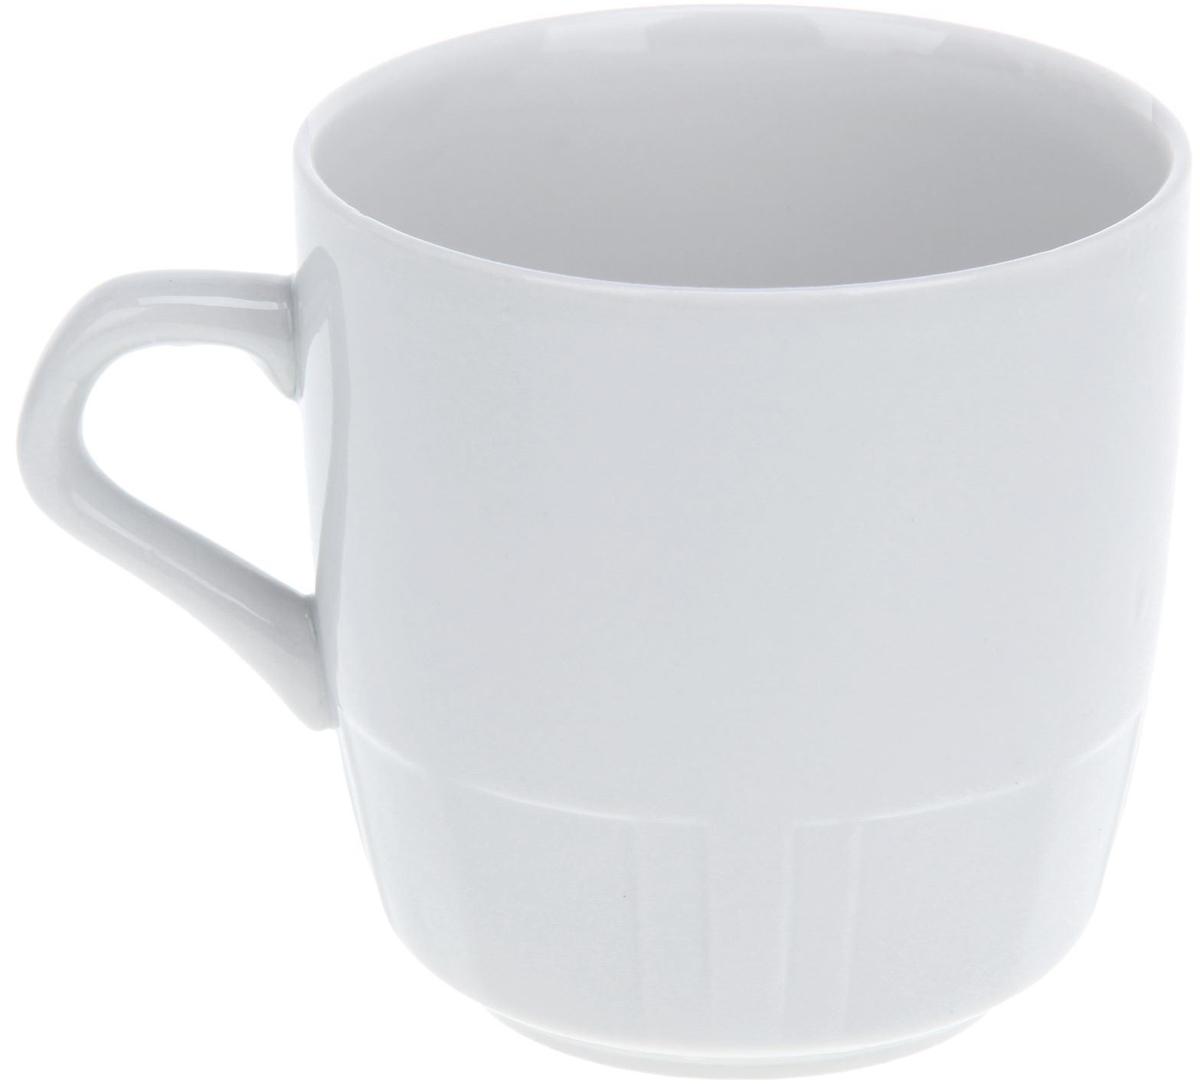 Кружка Фарфор Вербилок, 250 мл. 1333182 посуда из фарфора оптом